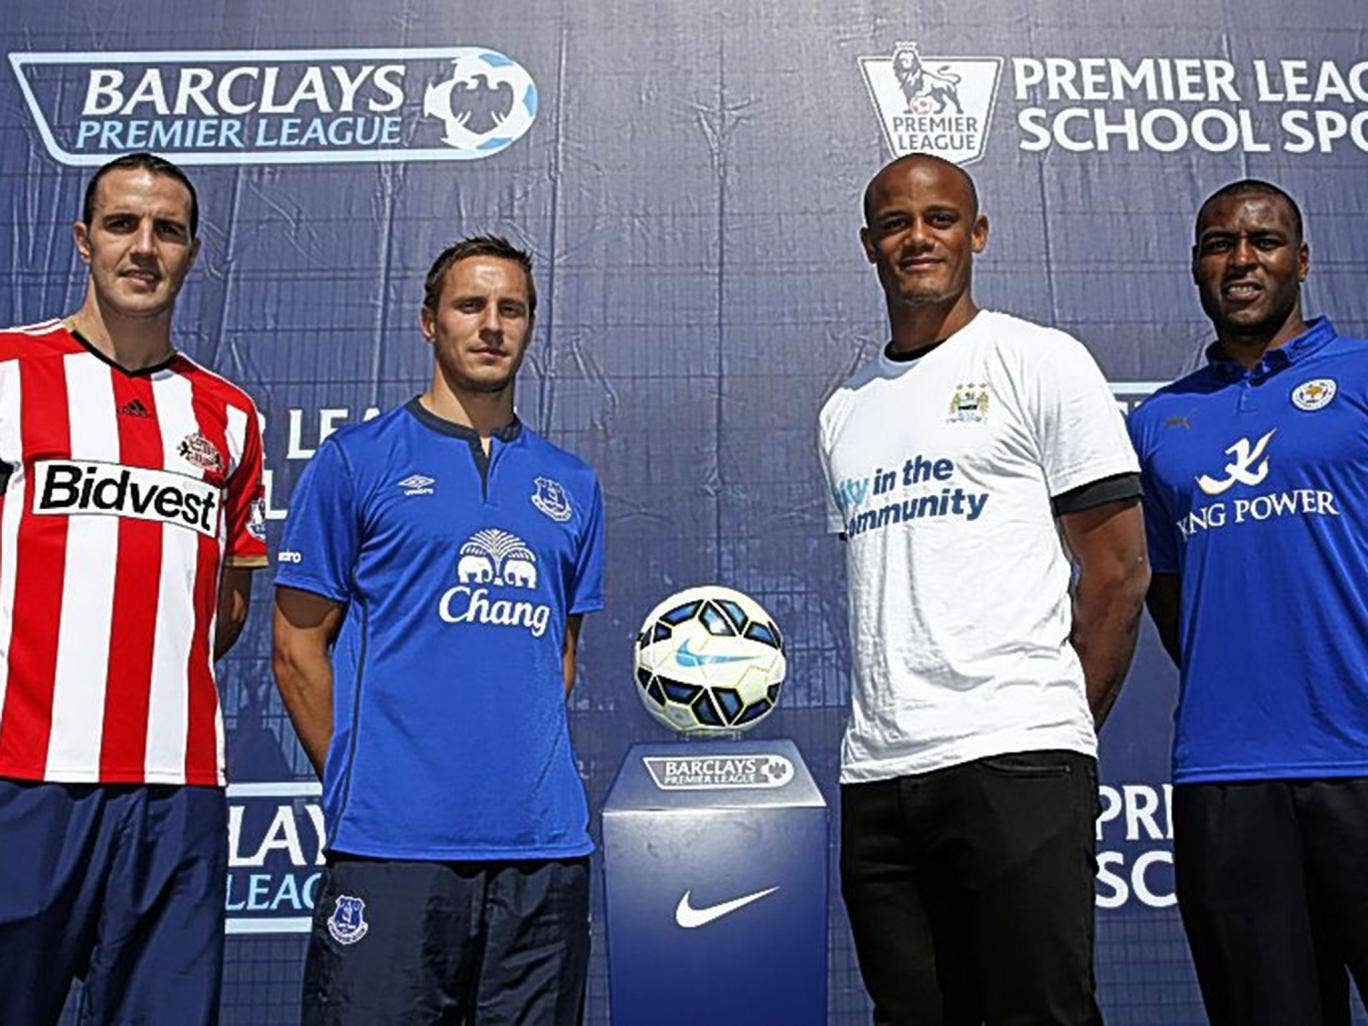 John O'Shea, Phil Jagielka, Vincent Kompany and Wes Morgan at the Premier League season launch